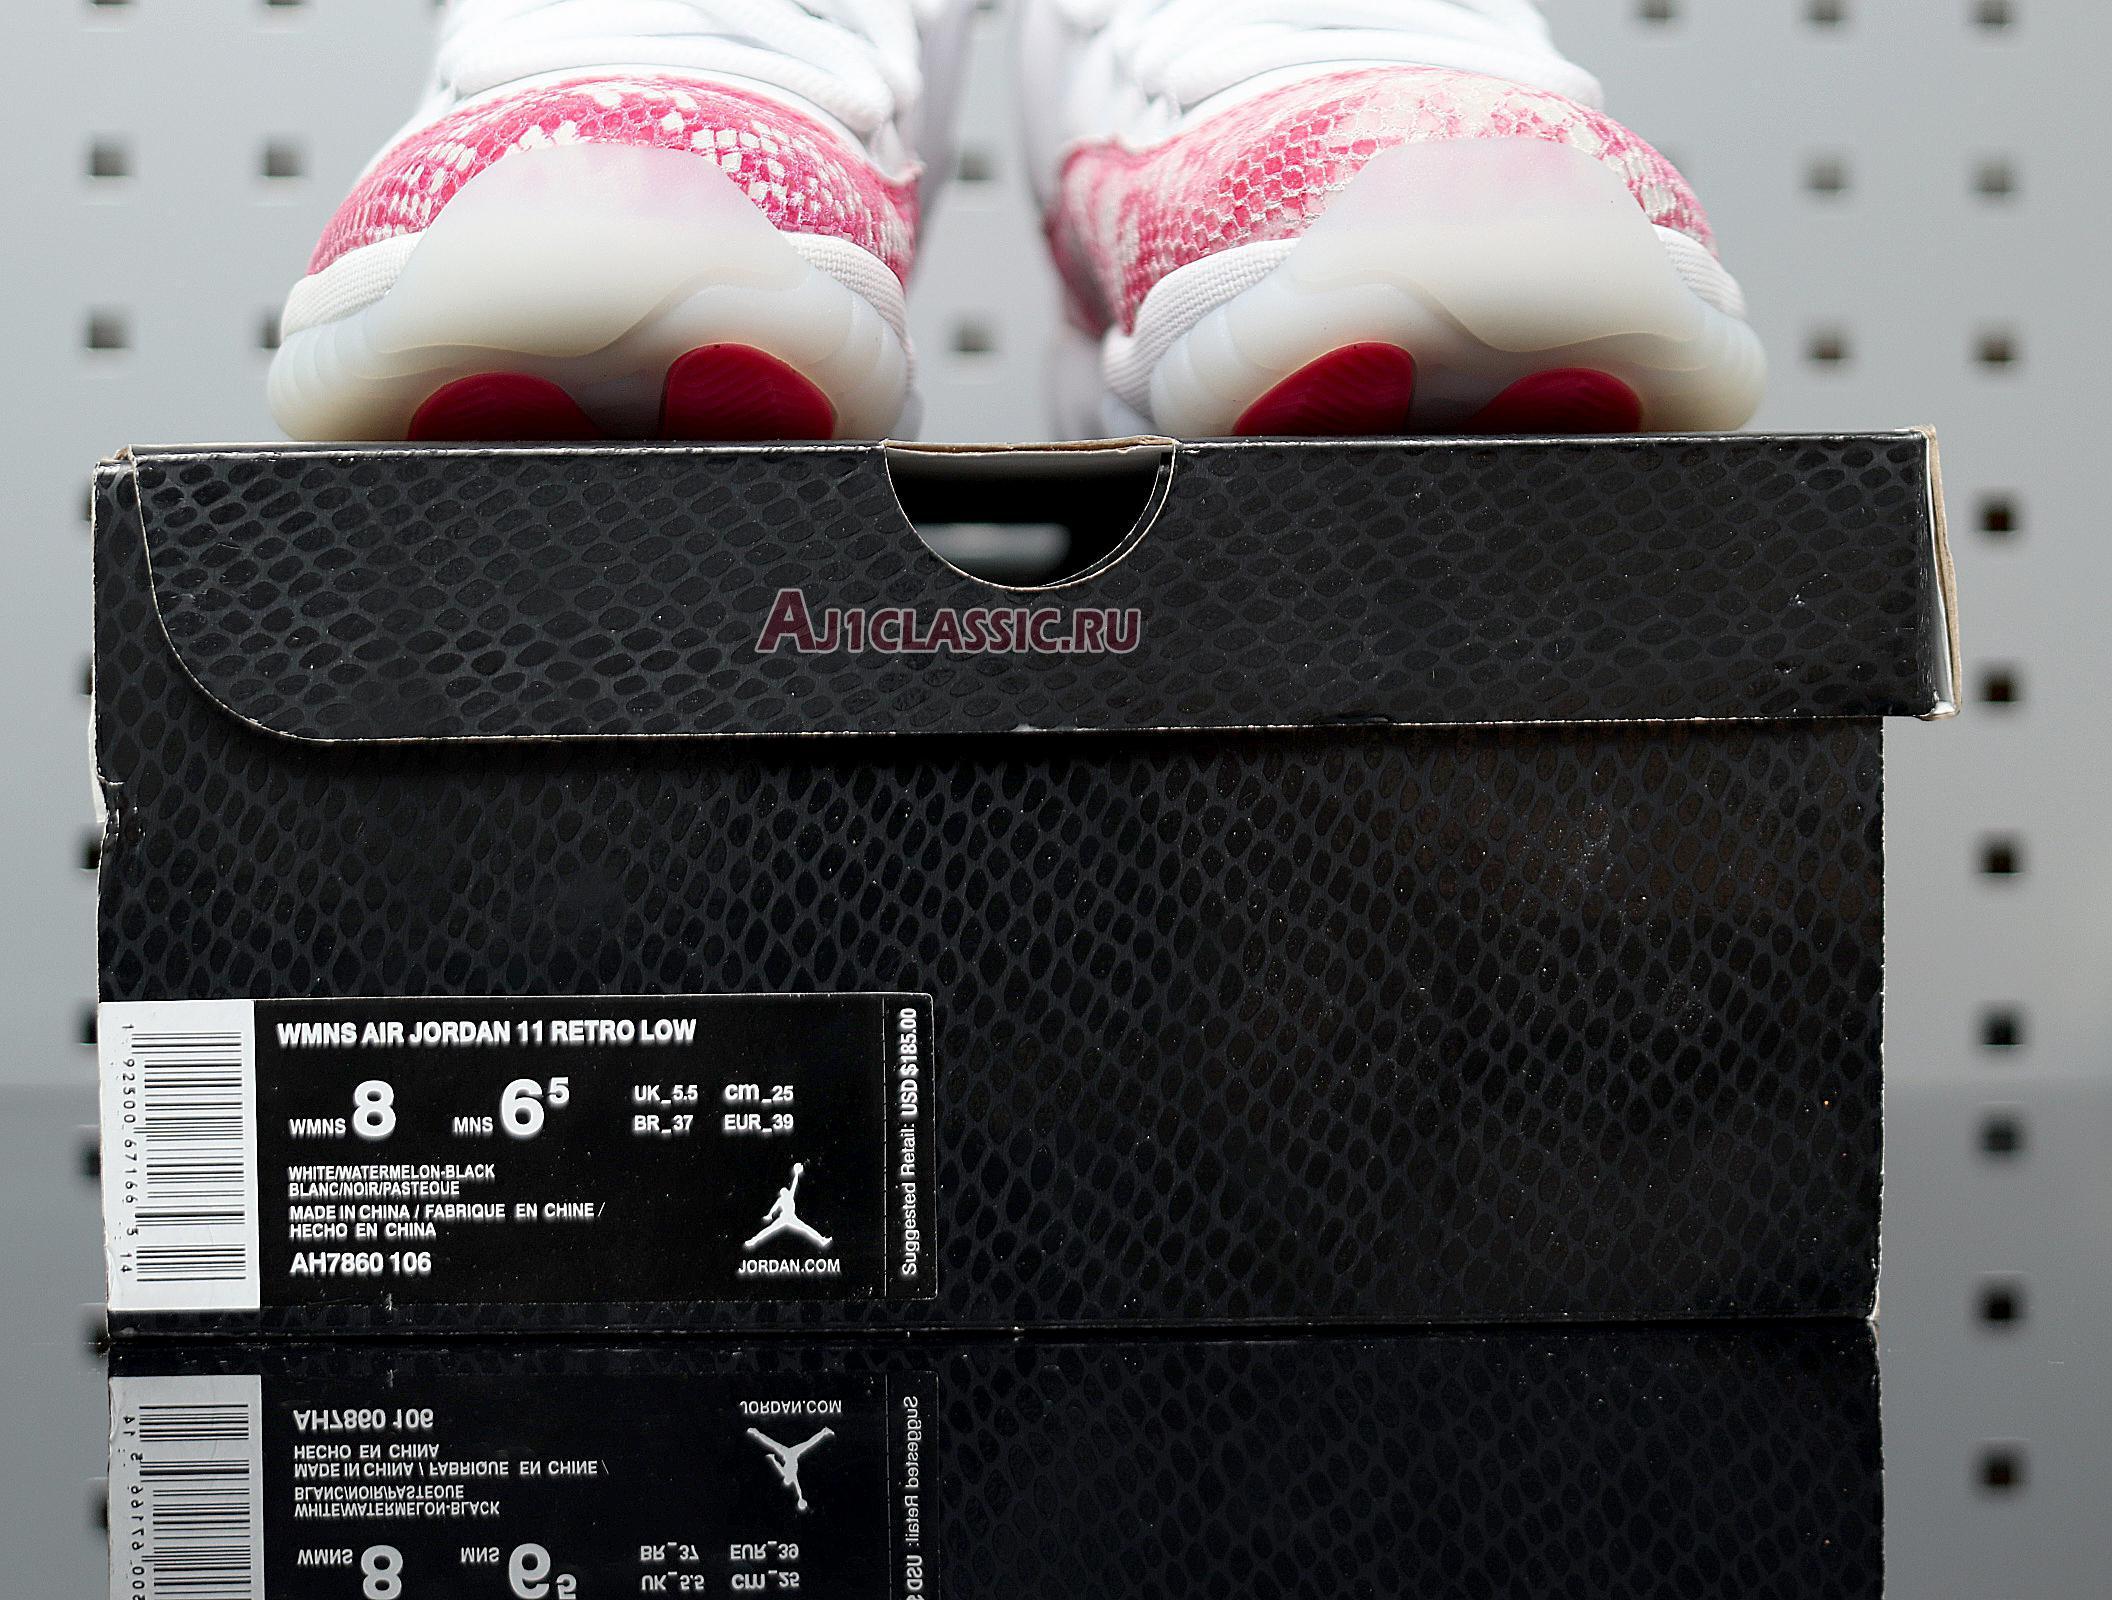 "Wmns Air Jordan 11 Retro Low ""Pink Snakeskin"" AH7860-106"